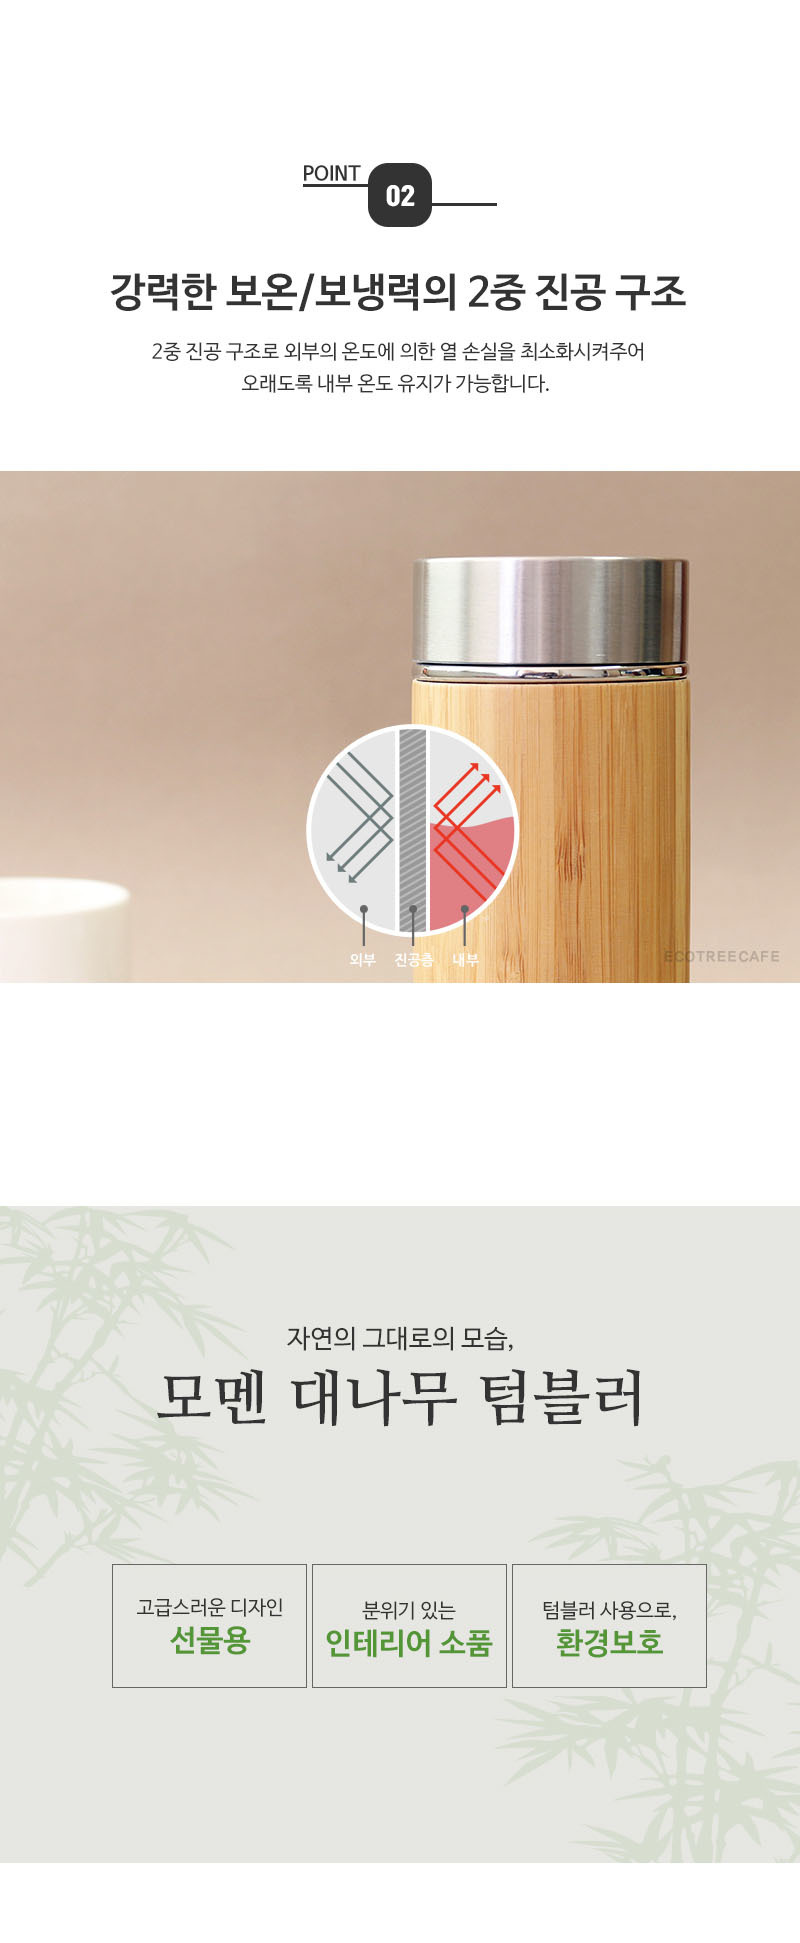 bamboo_03.jpg